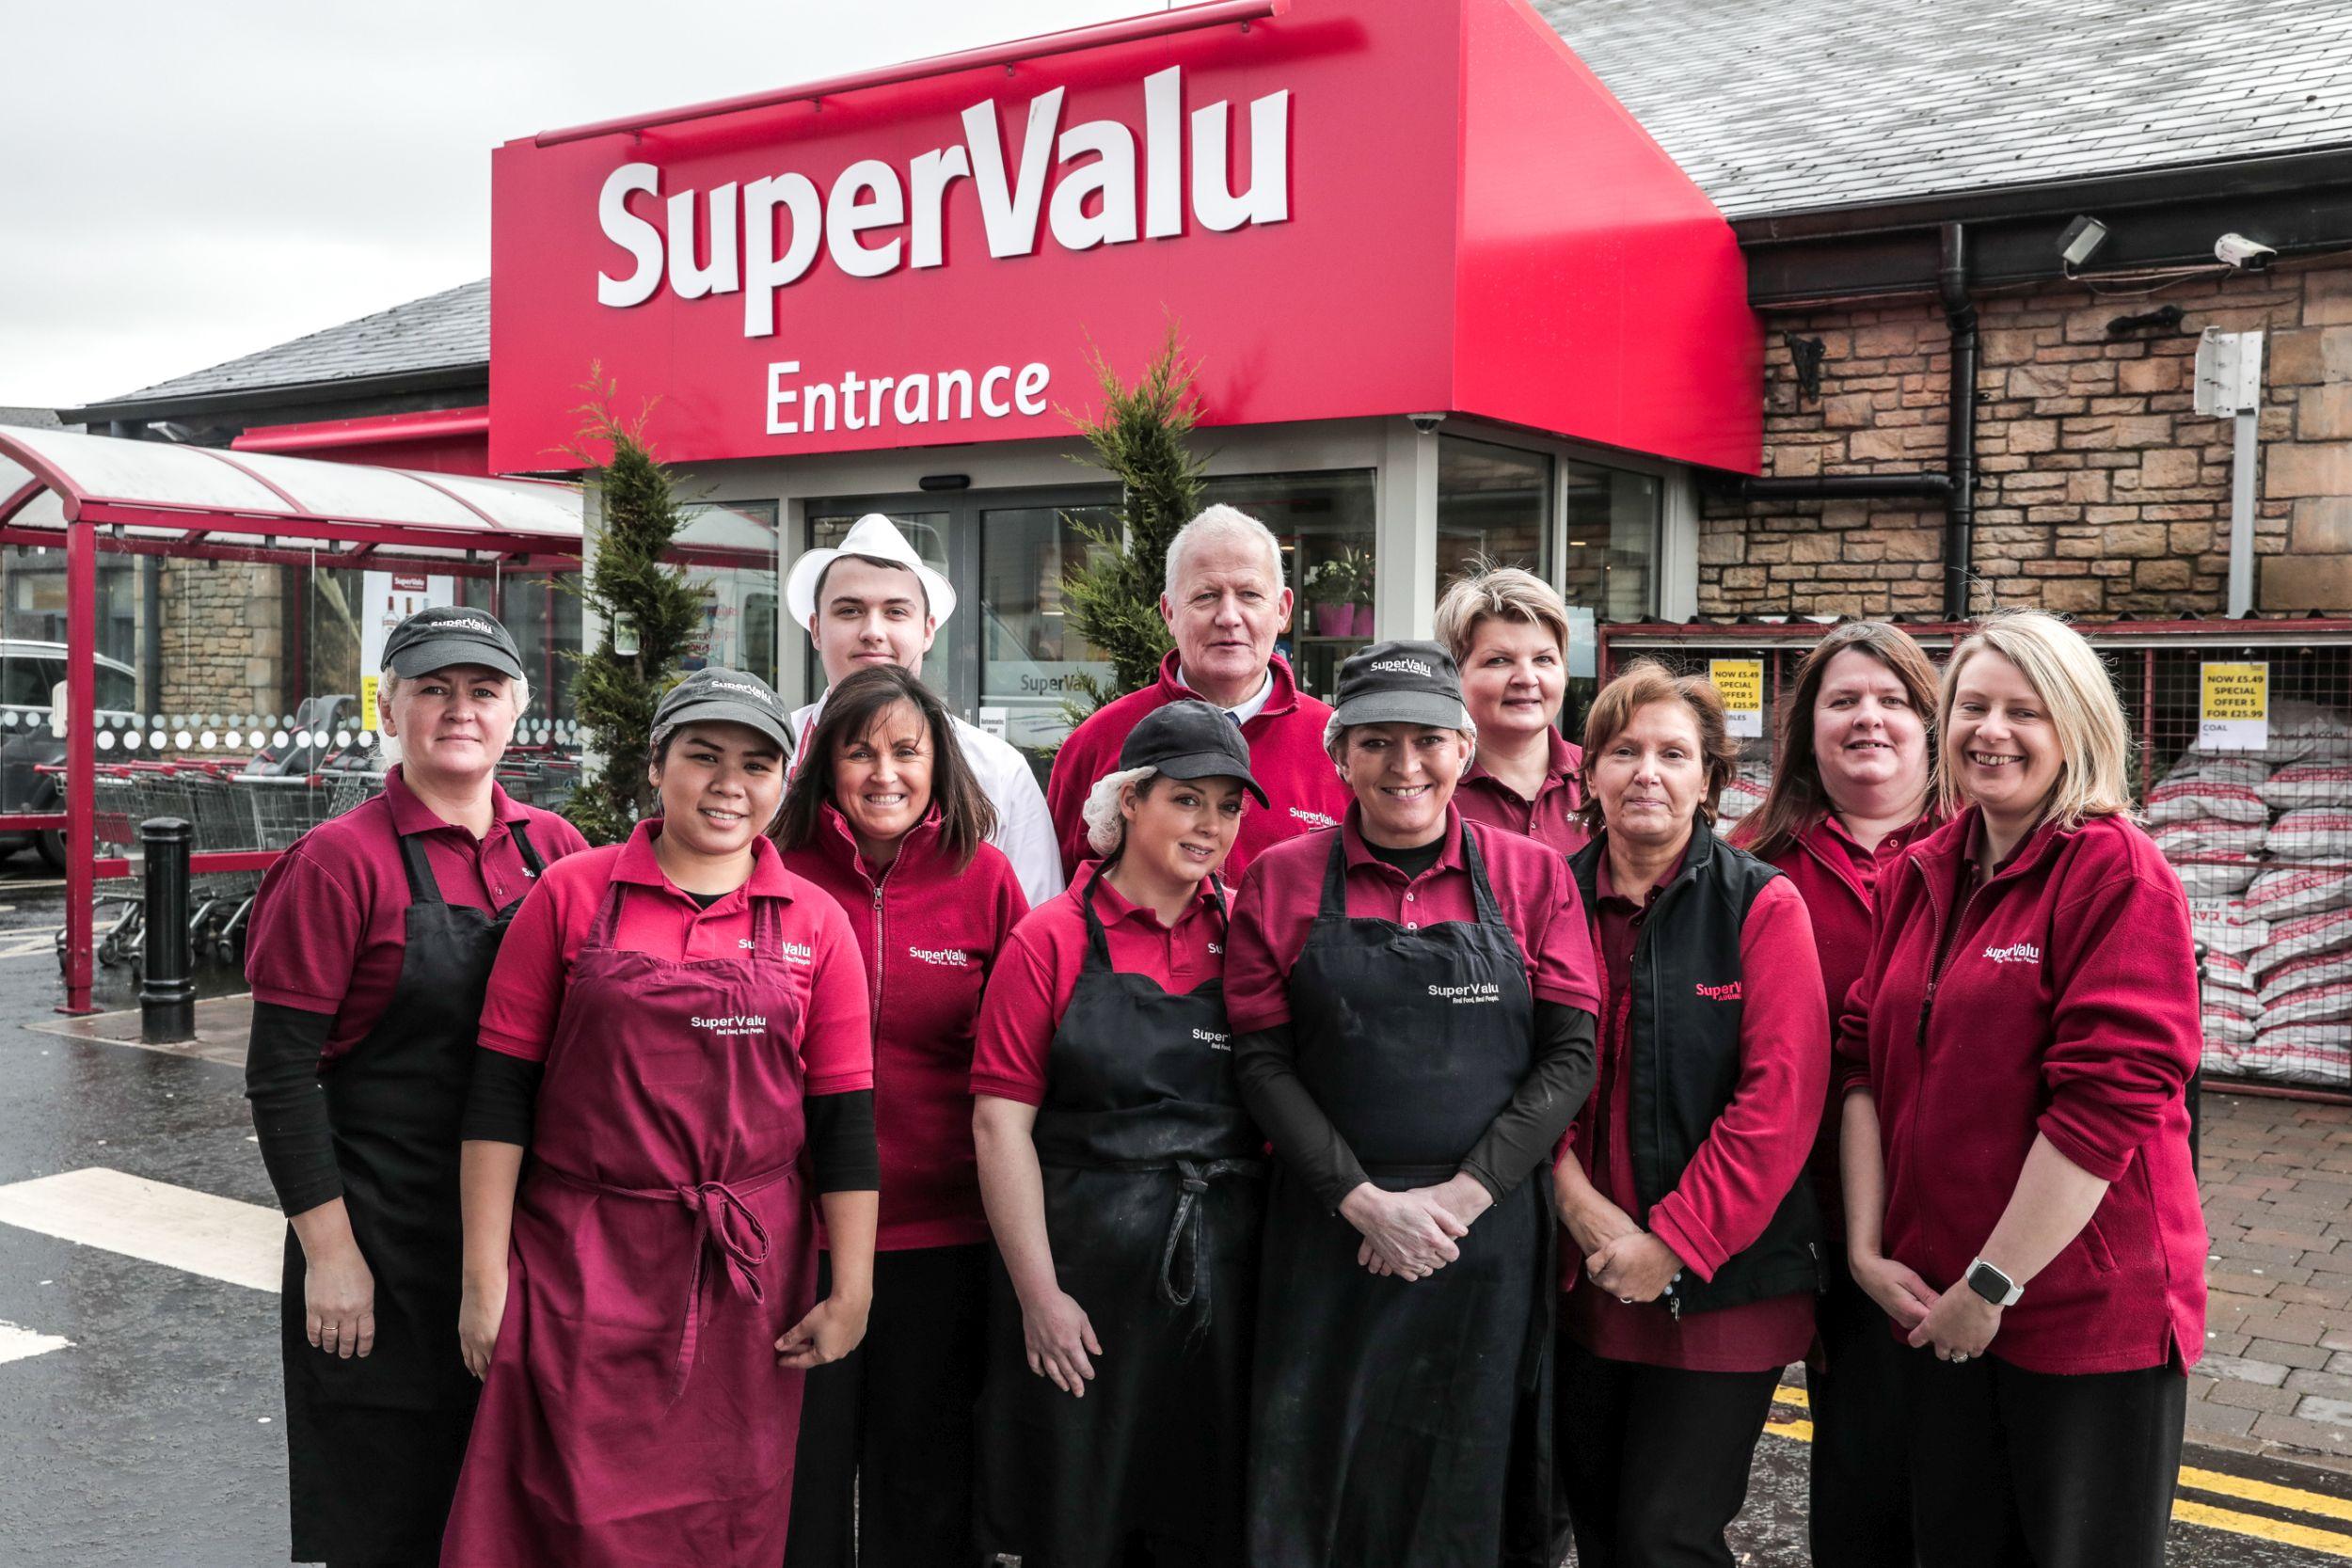 SuperValu soap sales surge by 400%